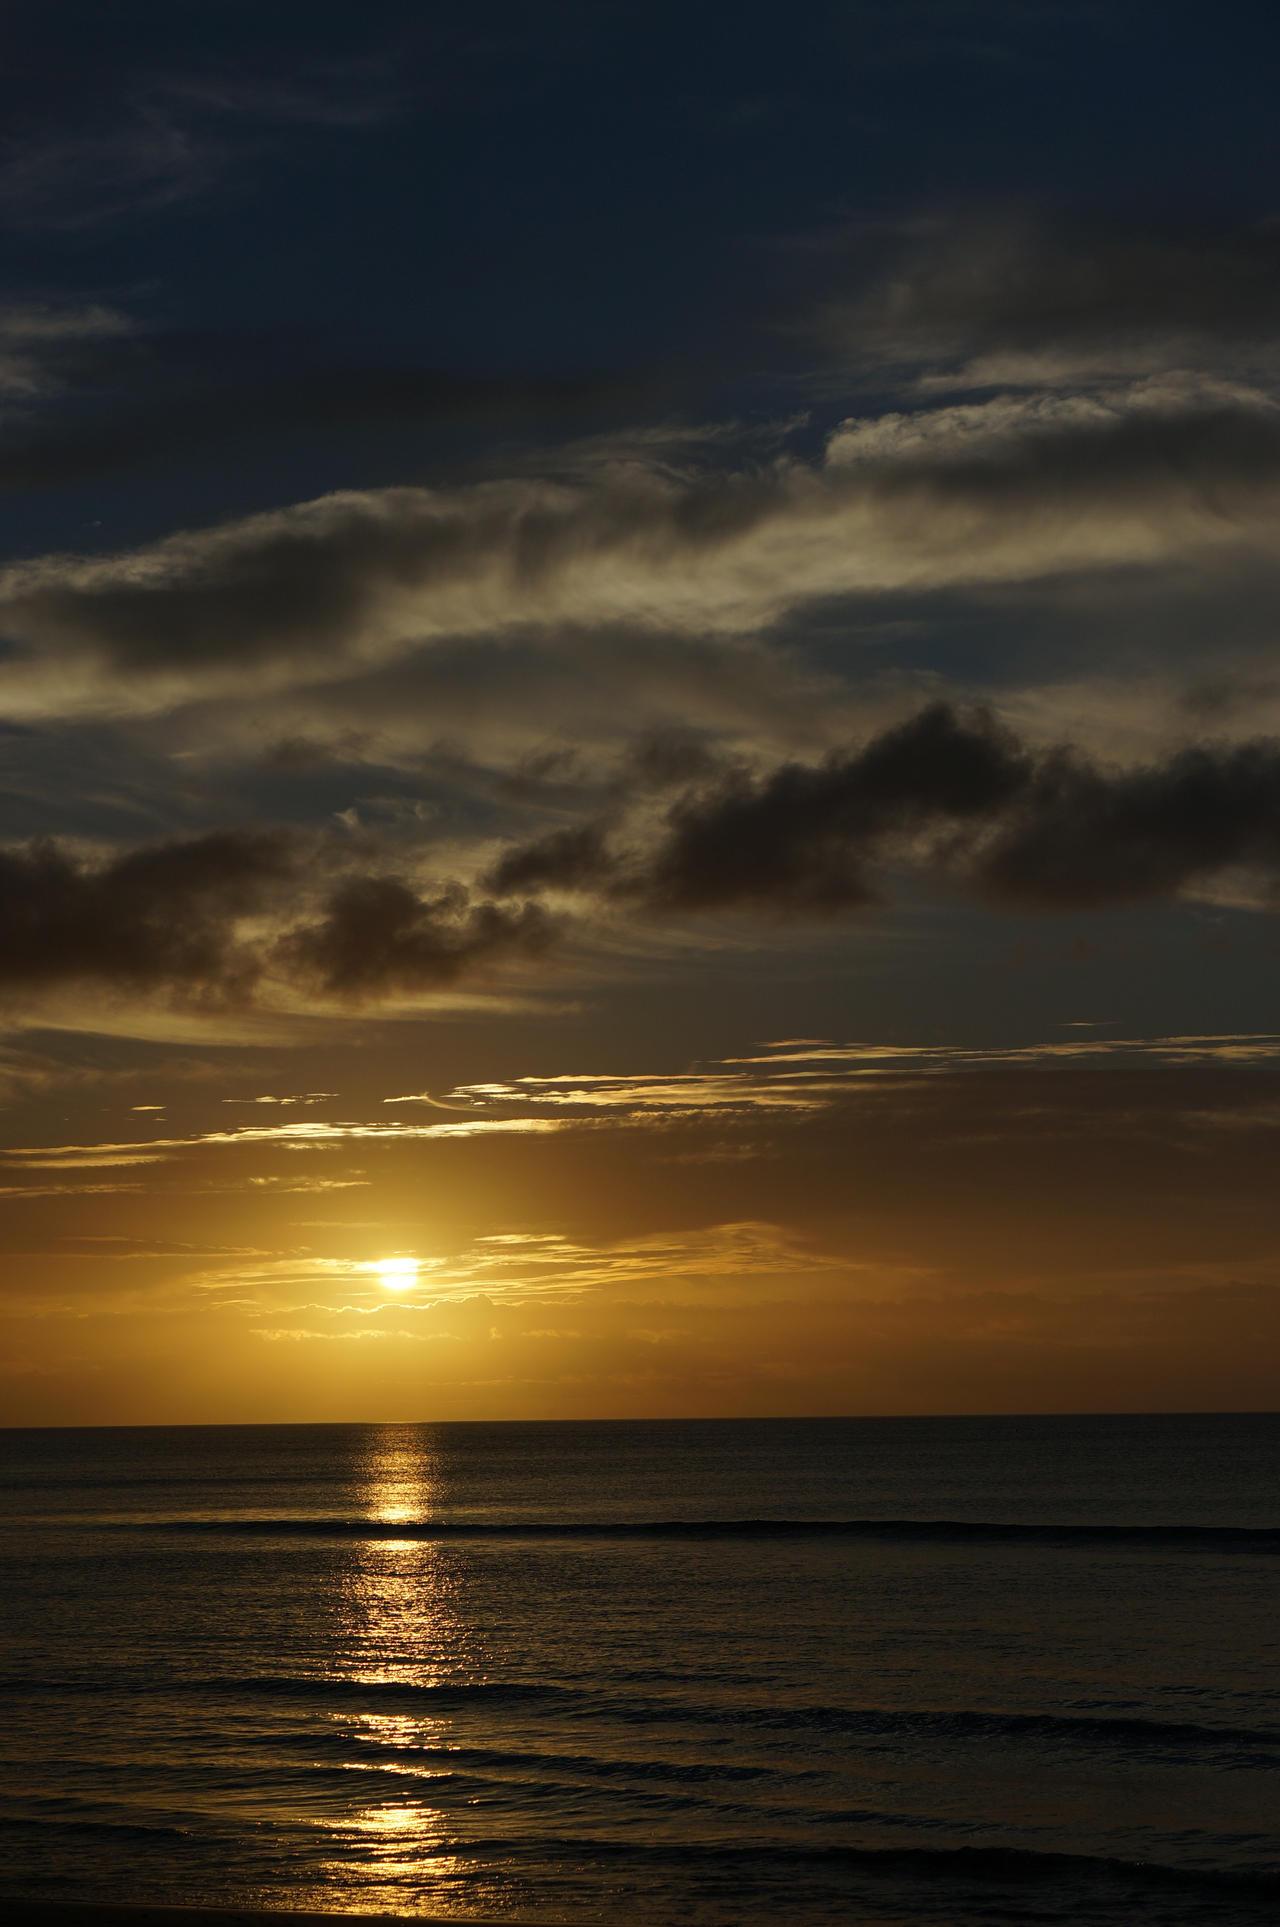 Just a sunrise by darthsabe